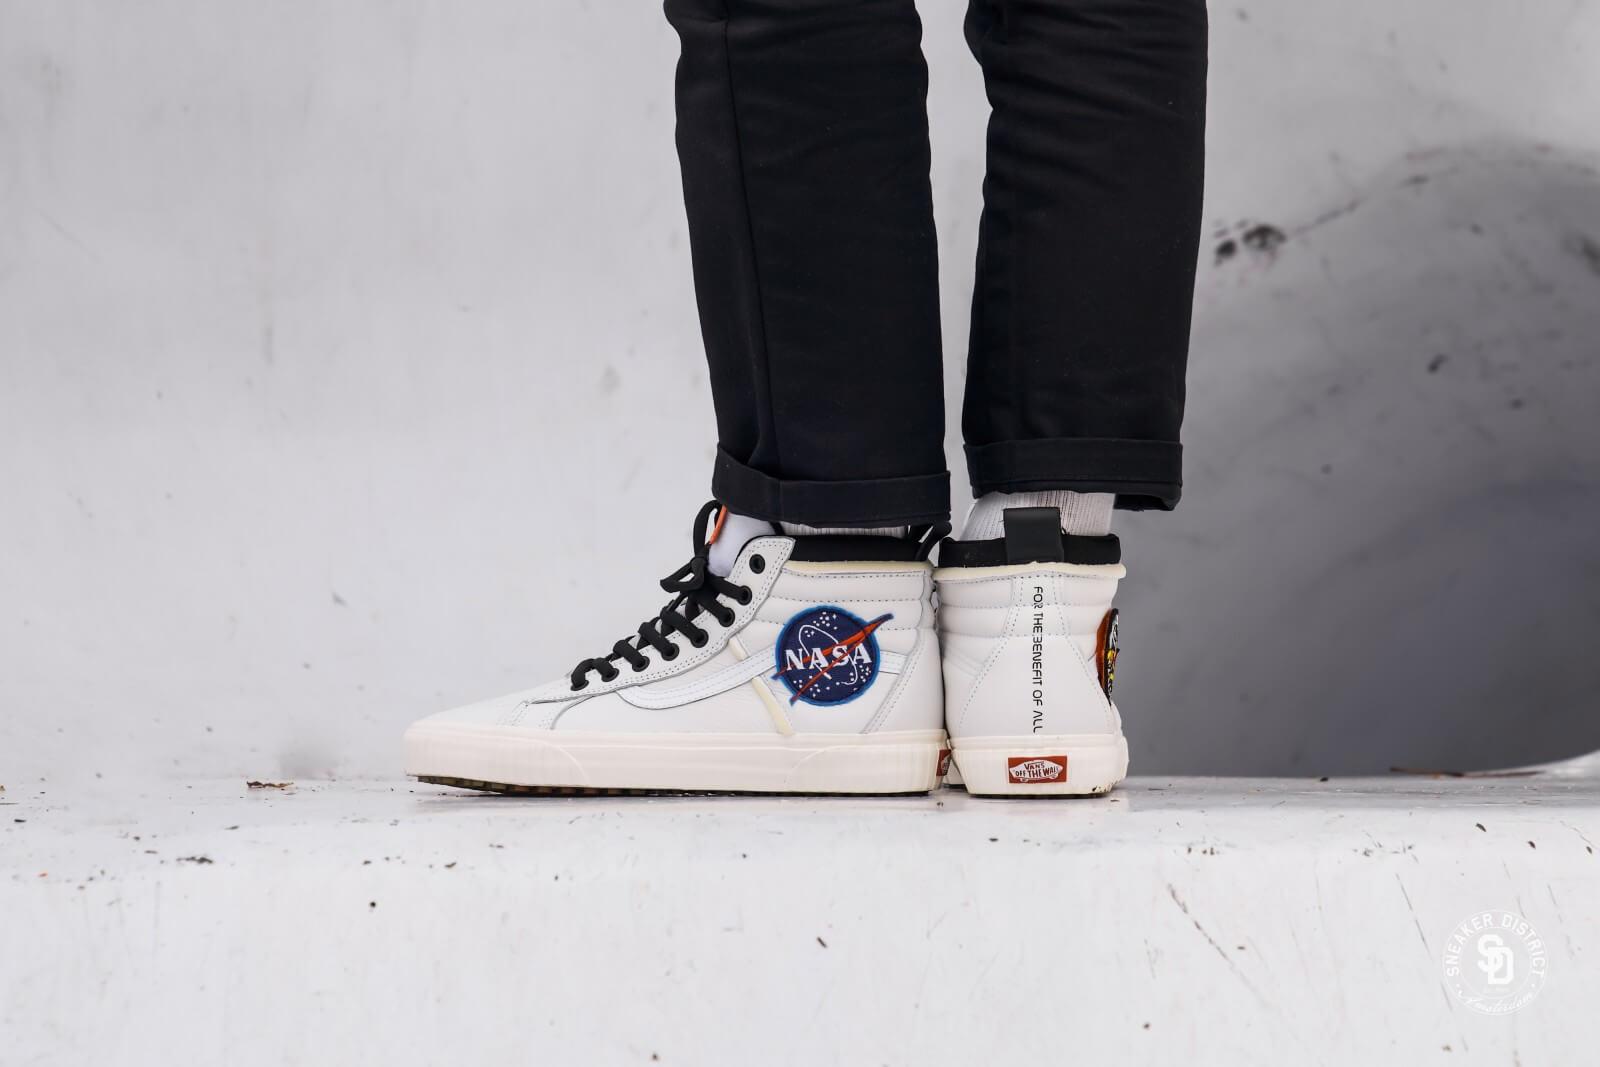 Vans x NASA Sk8-Hi 48 MTE DX Space Voyager White